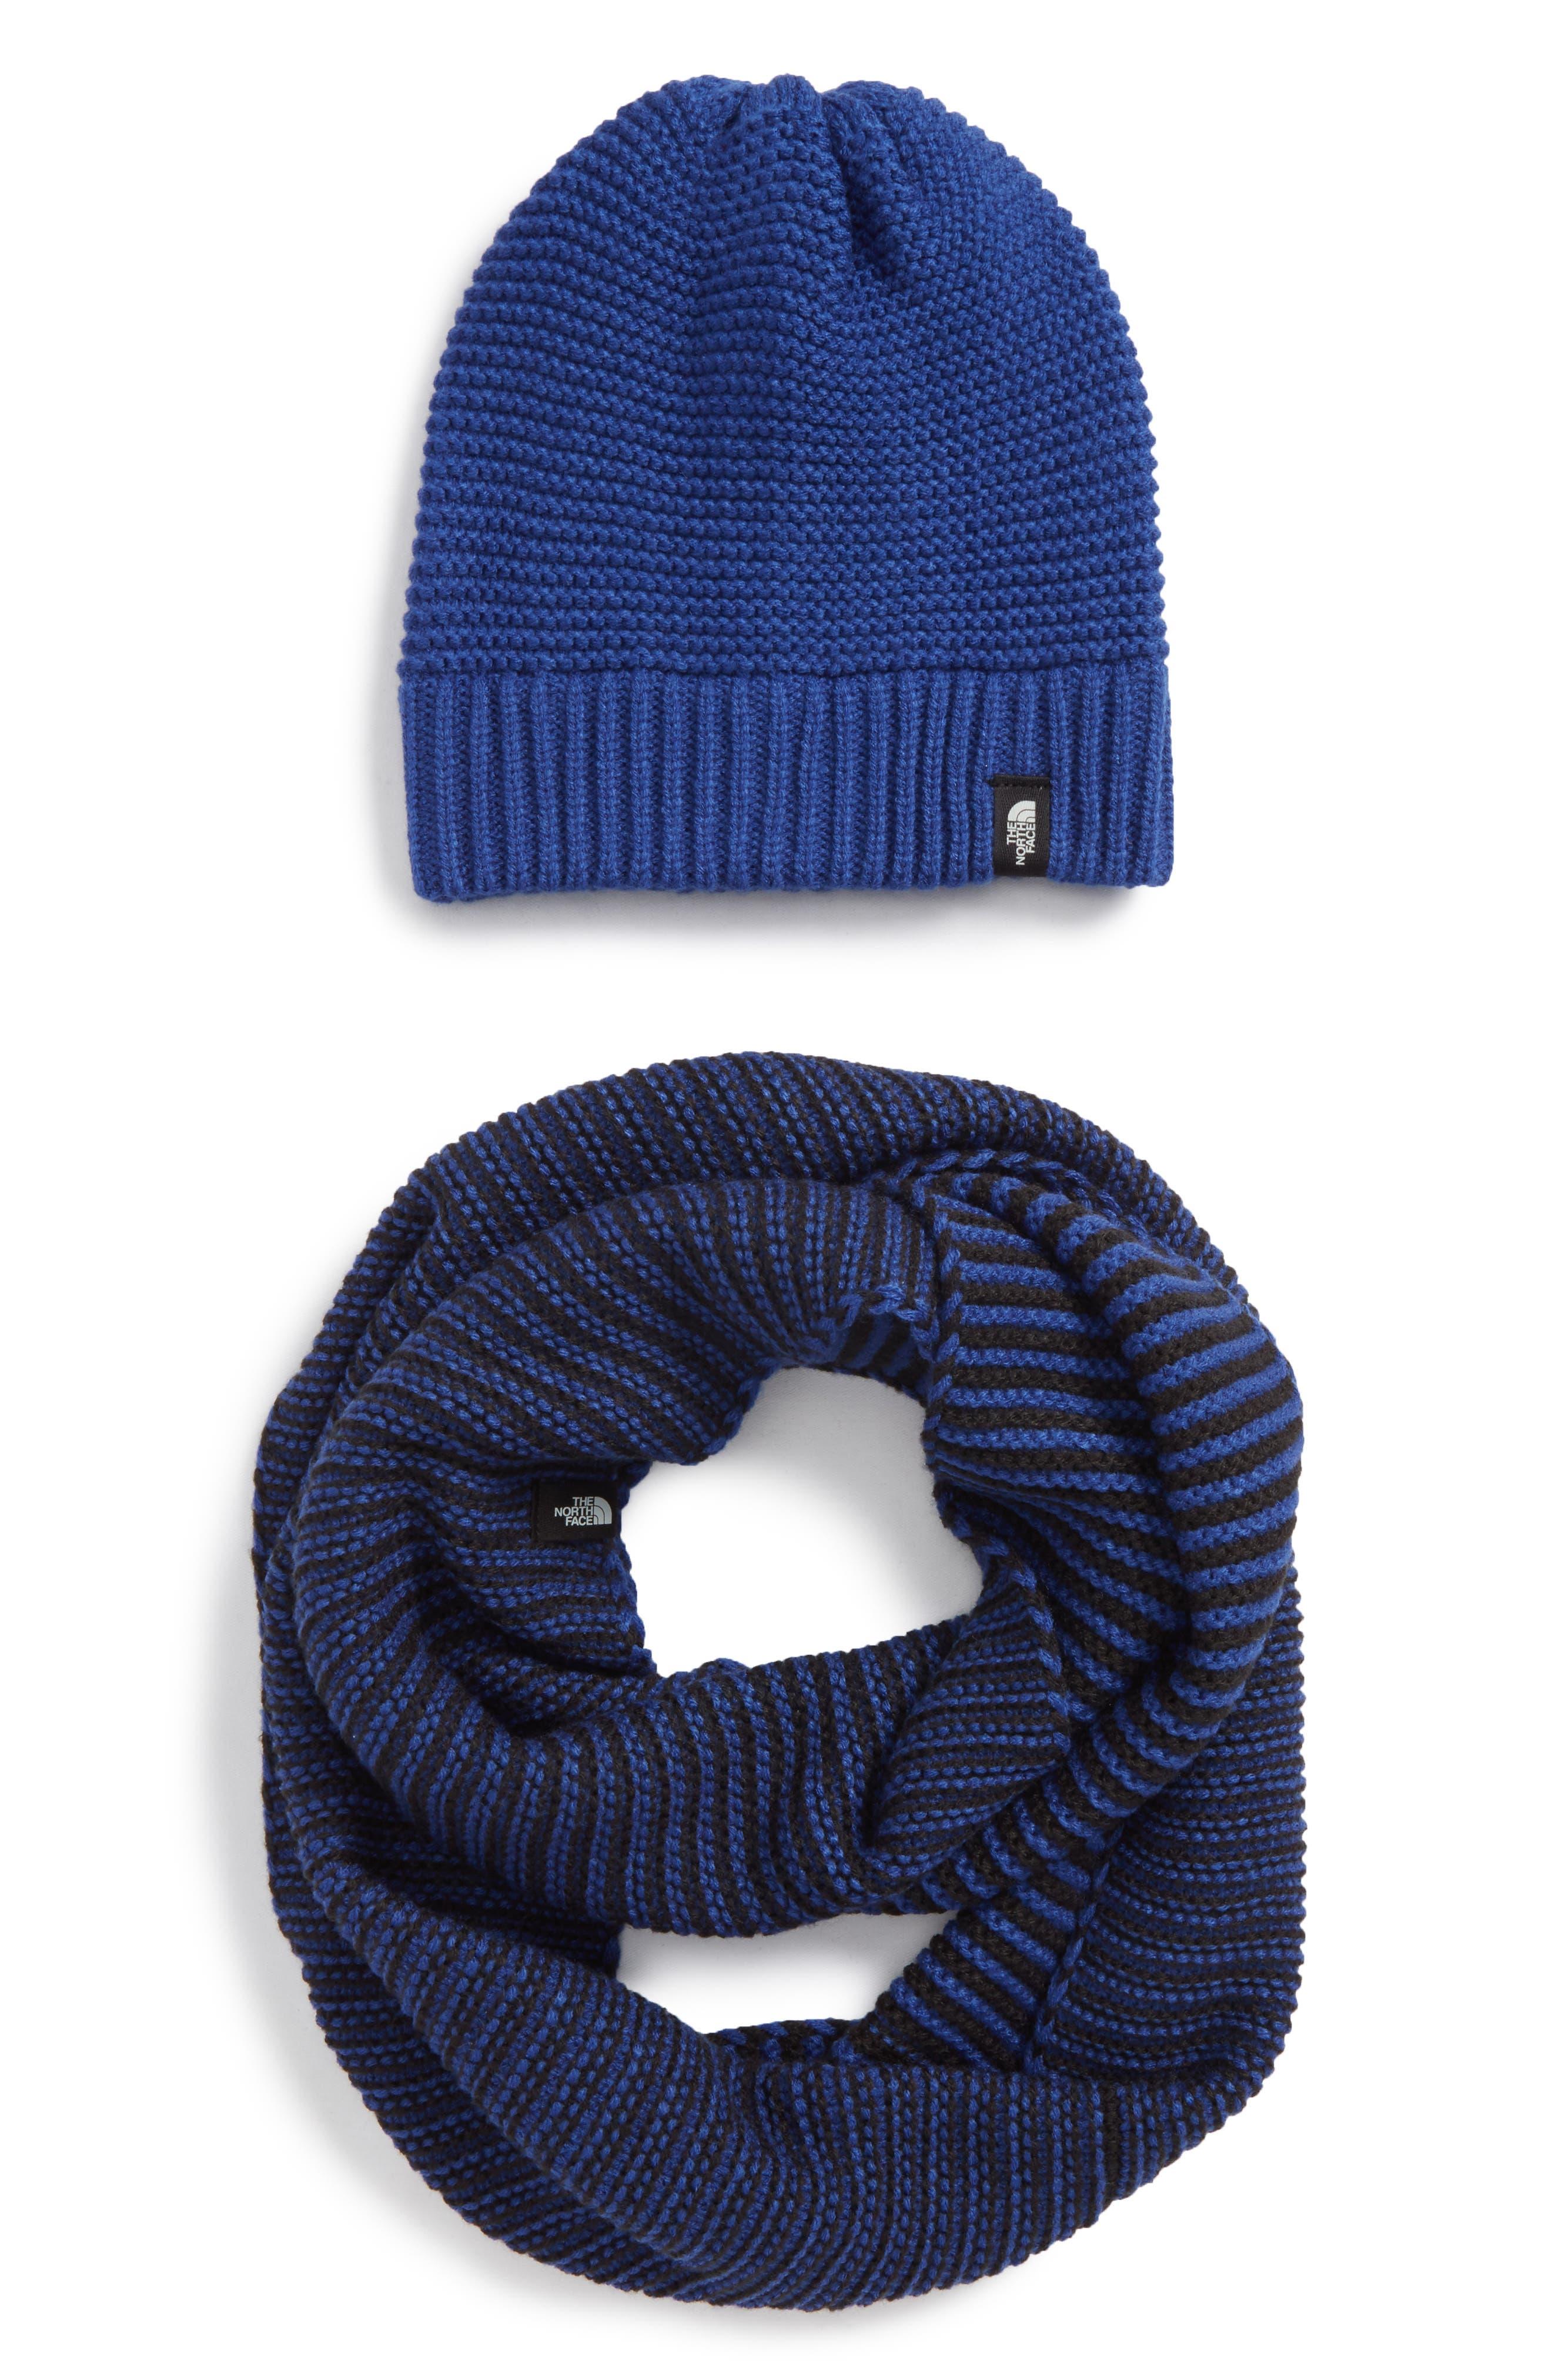 Purrl Stitch Beanie & Infinity Scarf Set,                         Main,                         color,